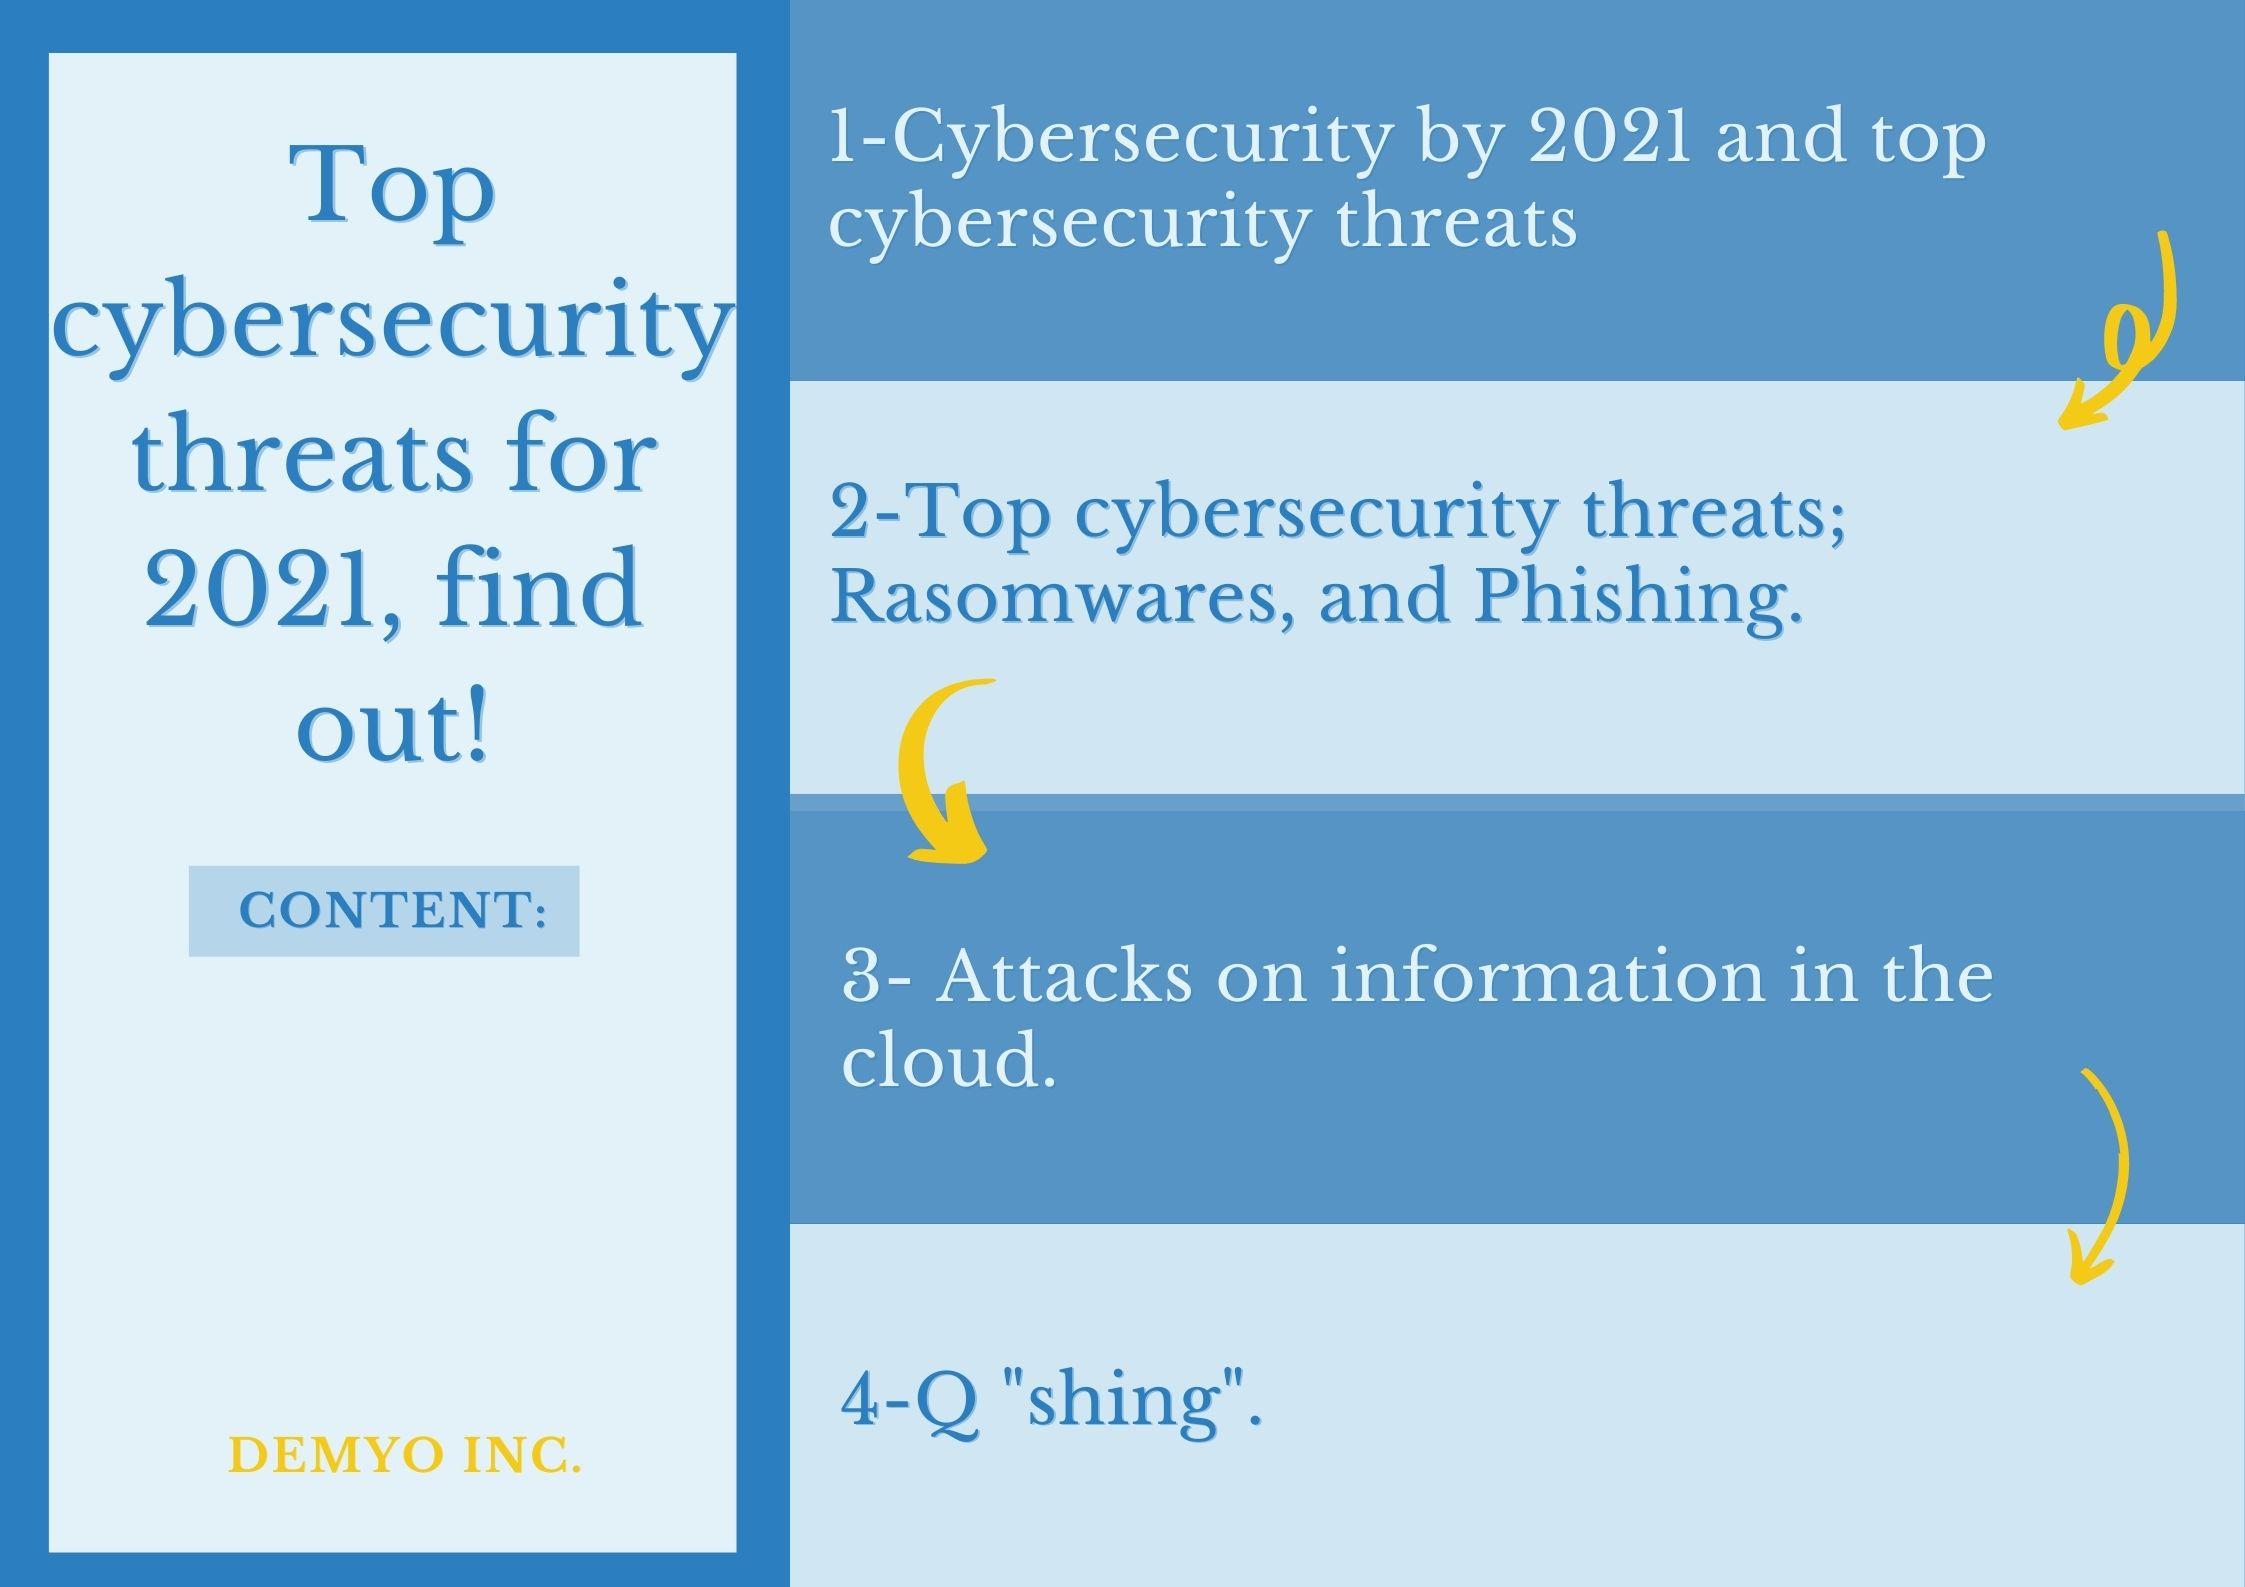 Top cybersecurity threats